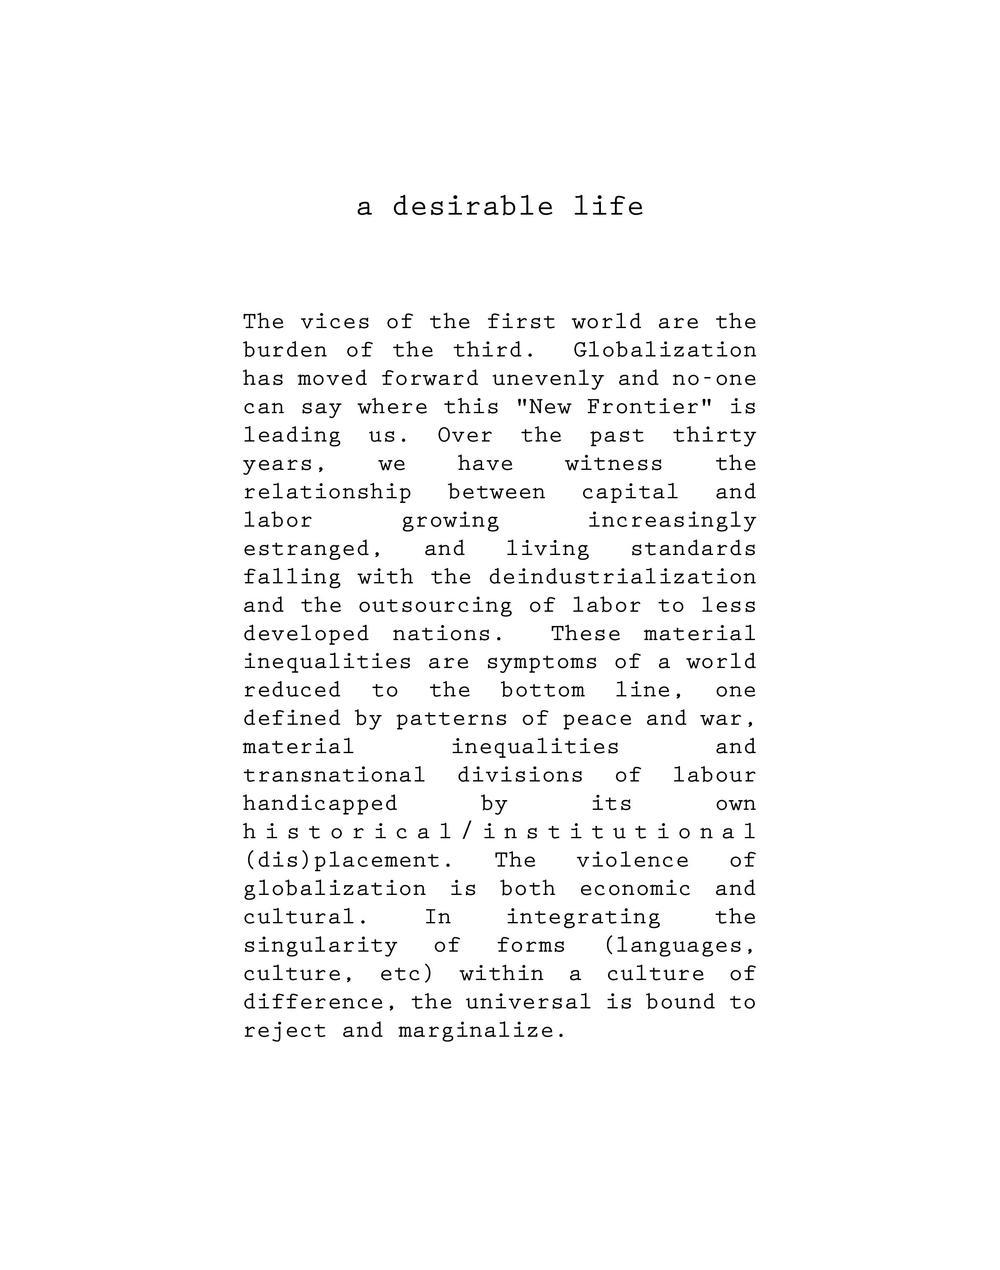 DesirableLife-Catalog-HEYDT-email-page-005.jpg